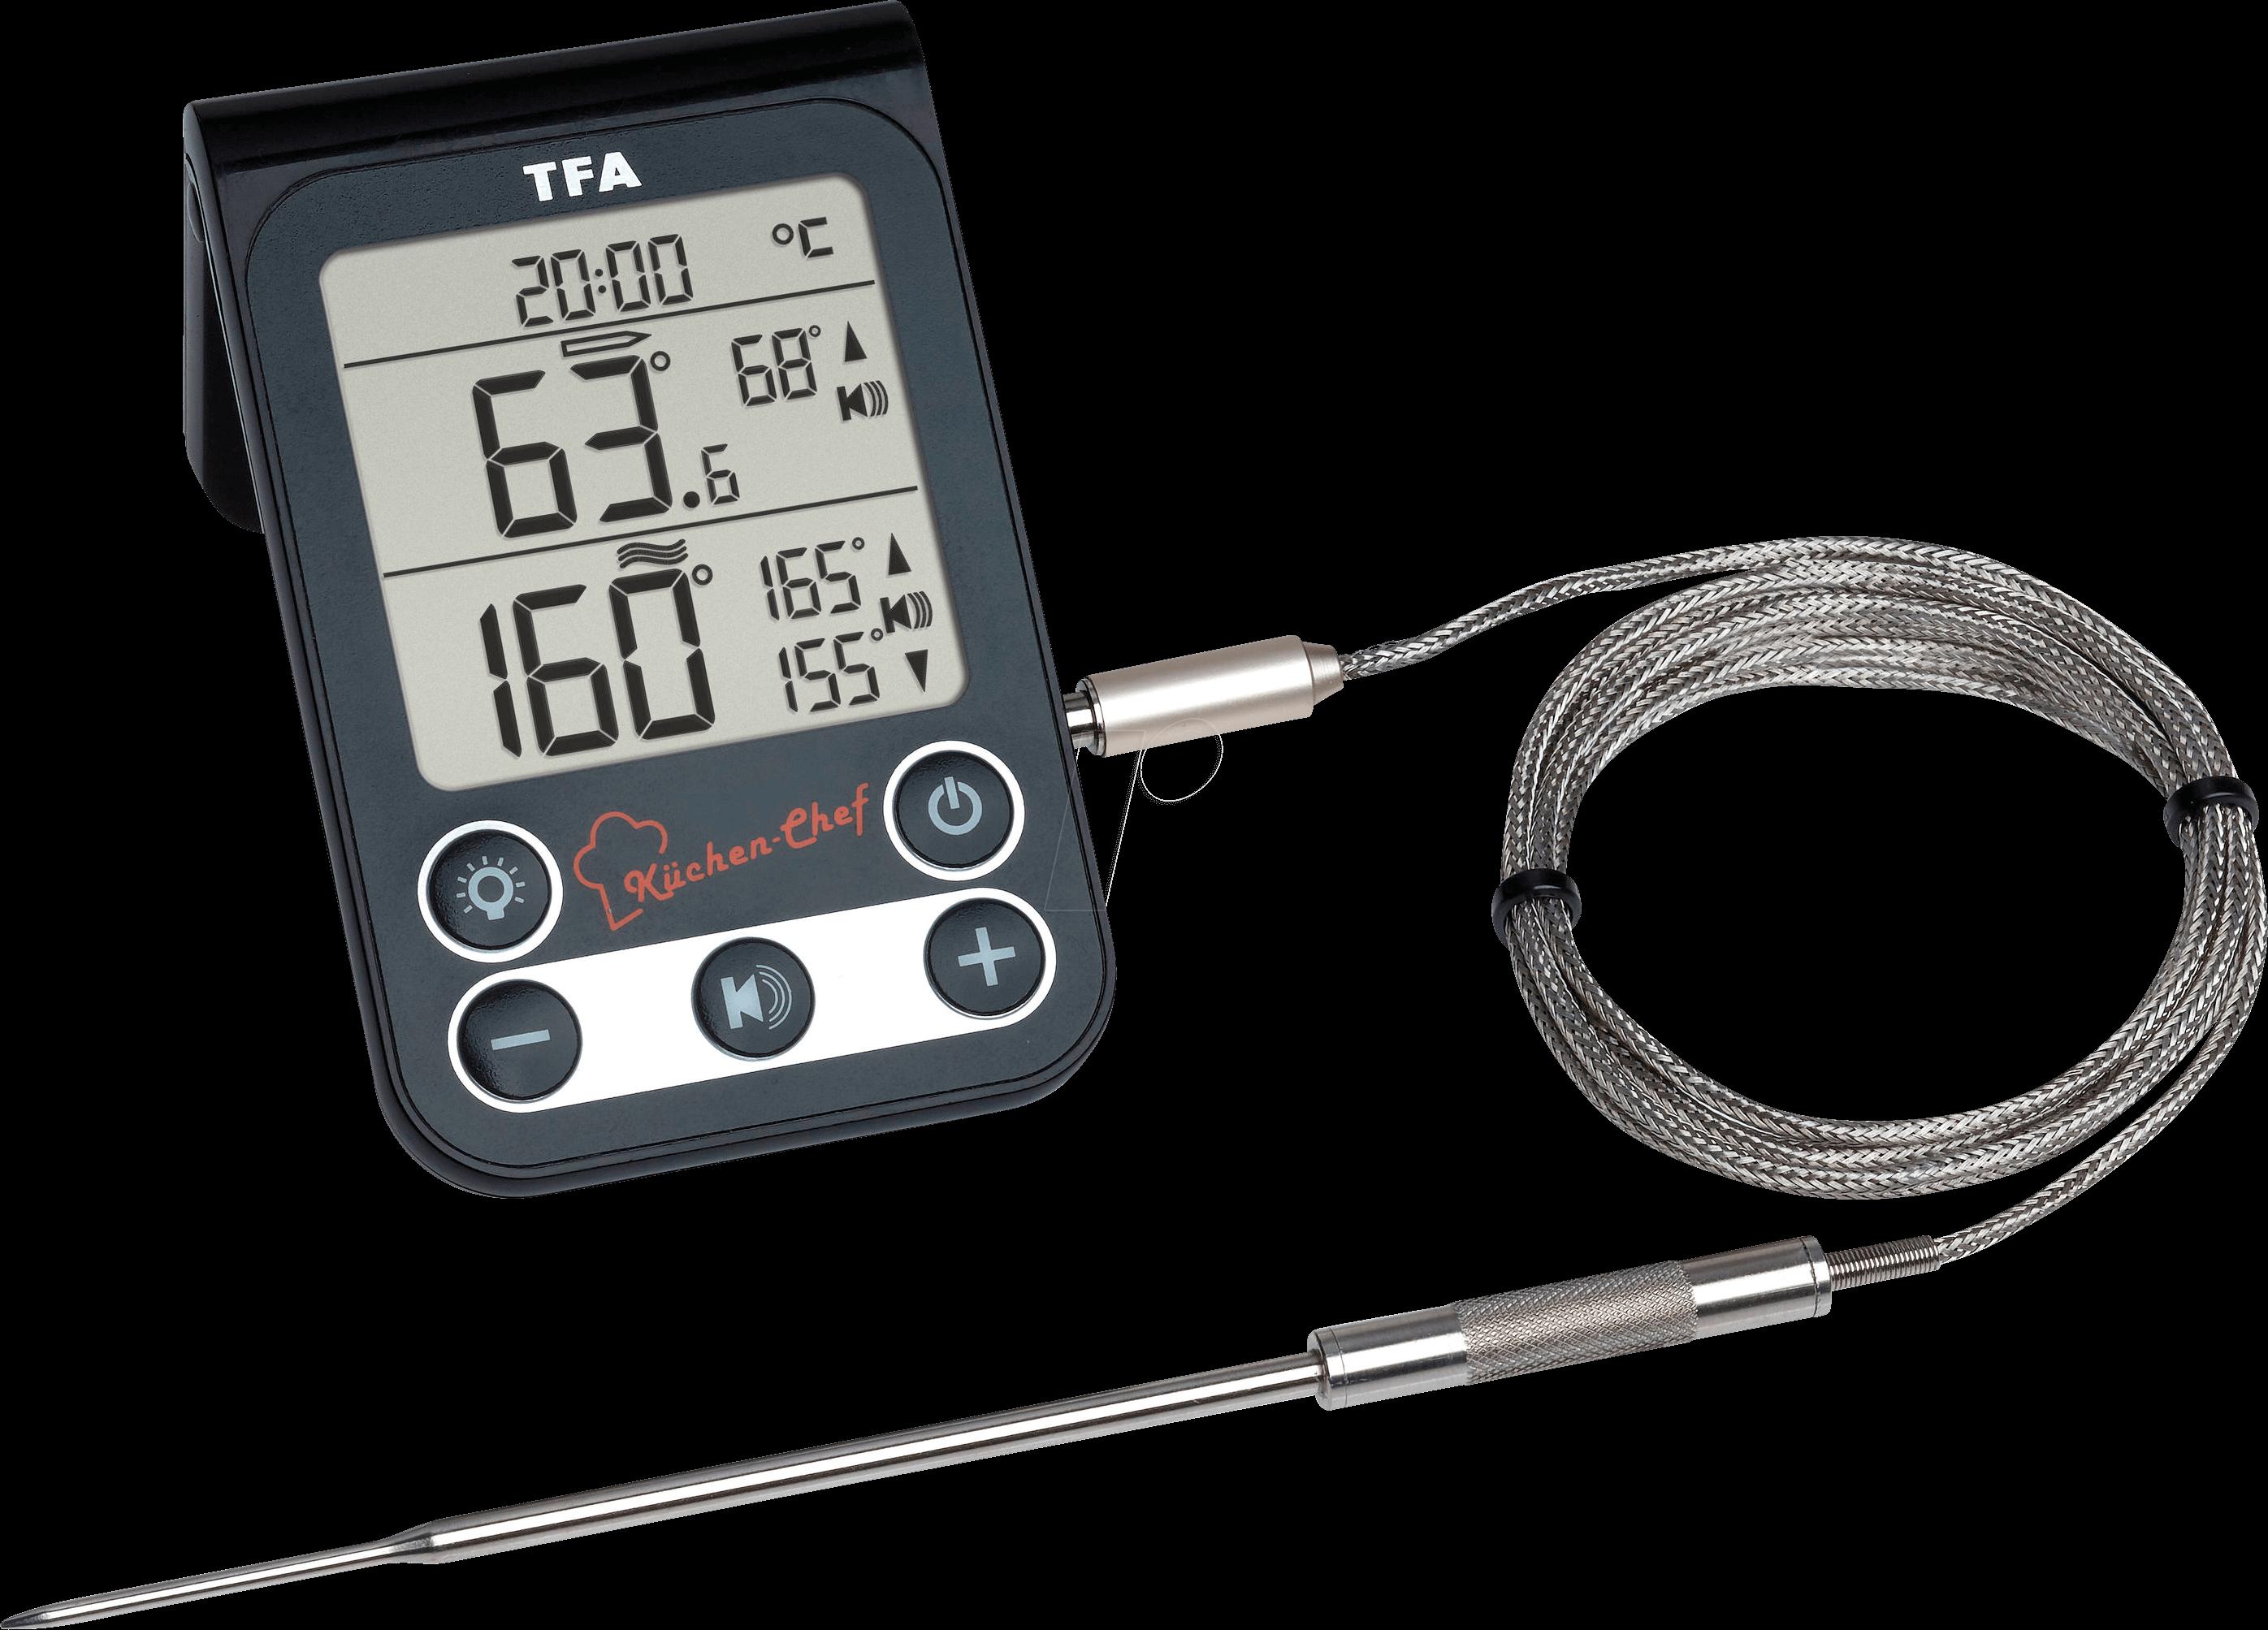 TFA 14151201 - Grill-roast / oven thermometer, digital